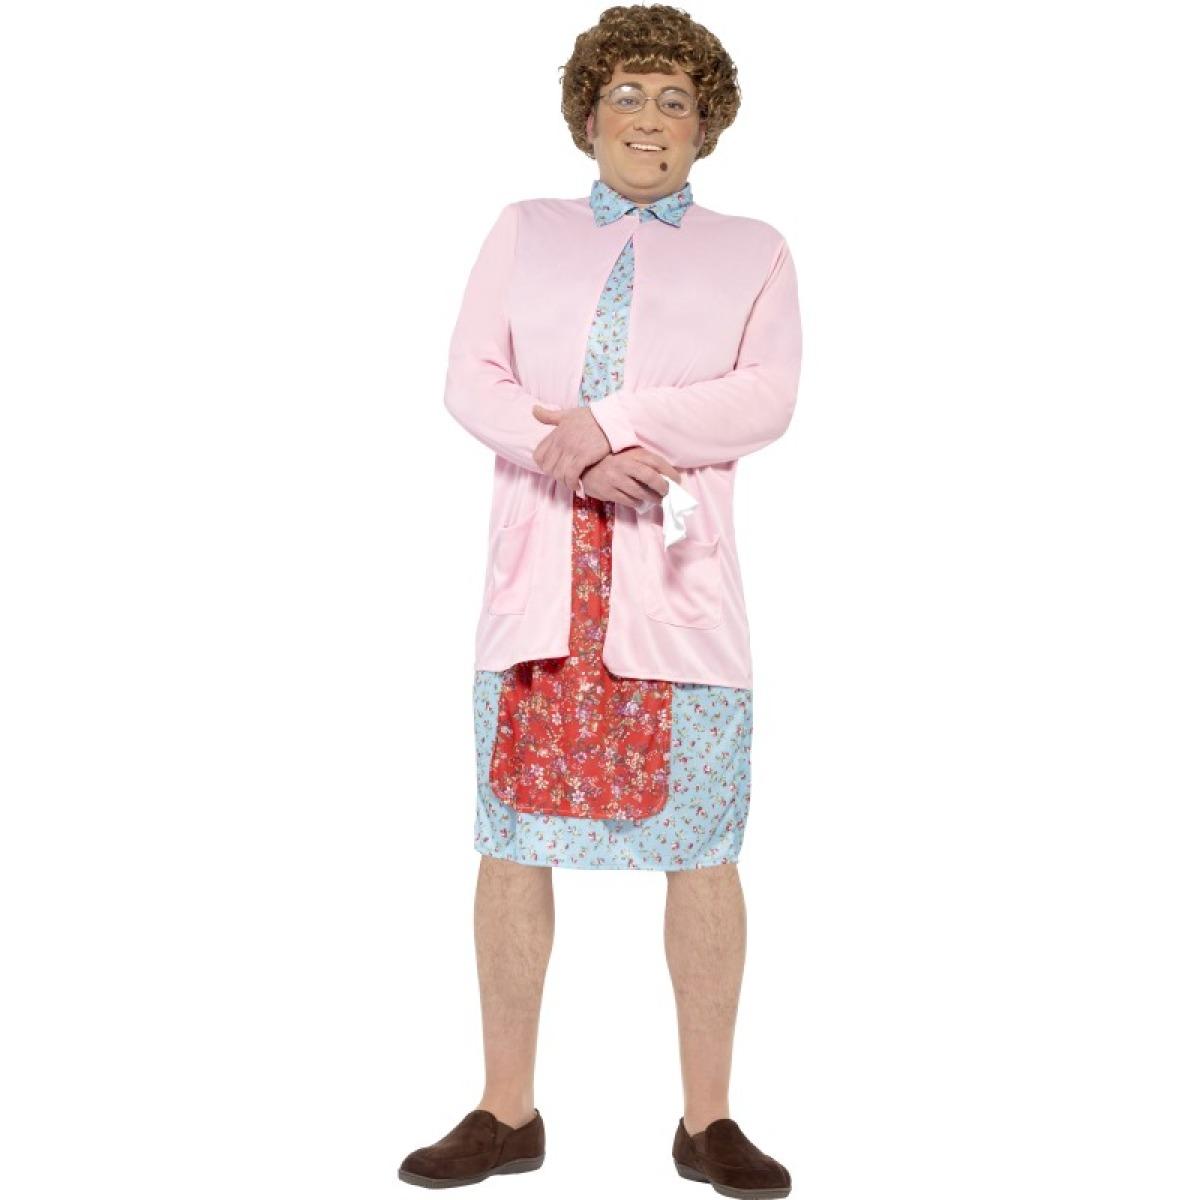 4406d485f93e Womens Funny Fancy Dress Uk - raveitsafe